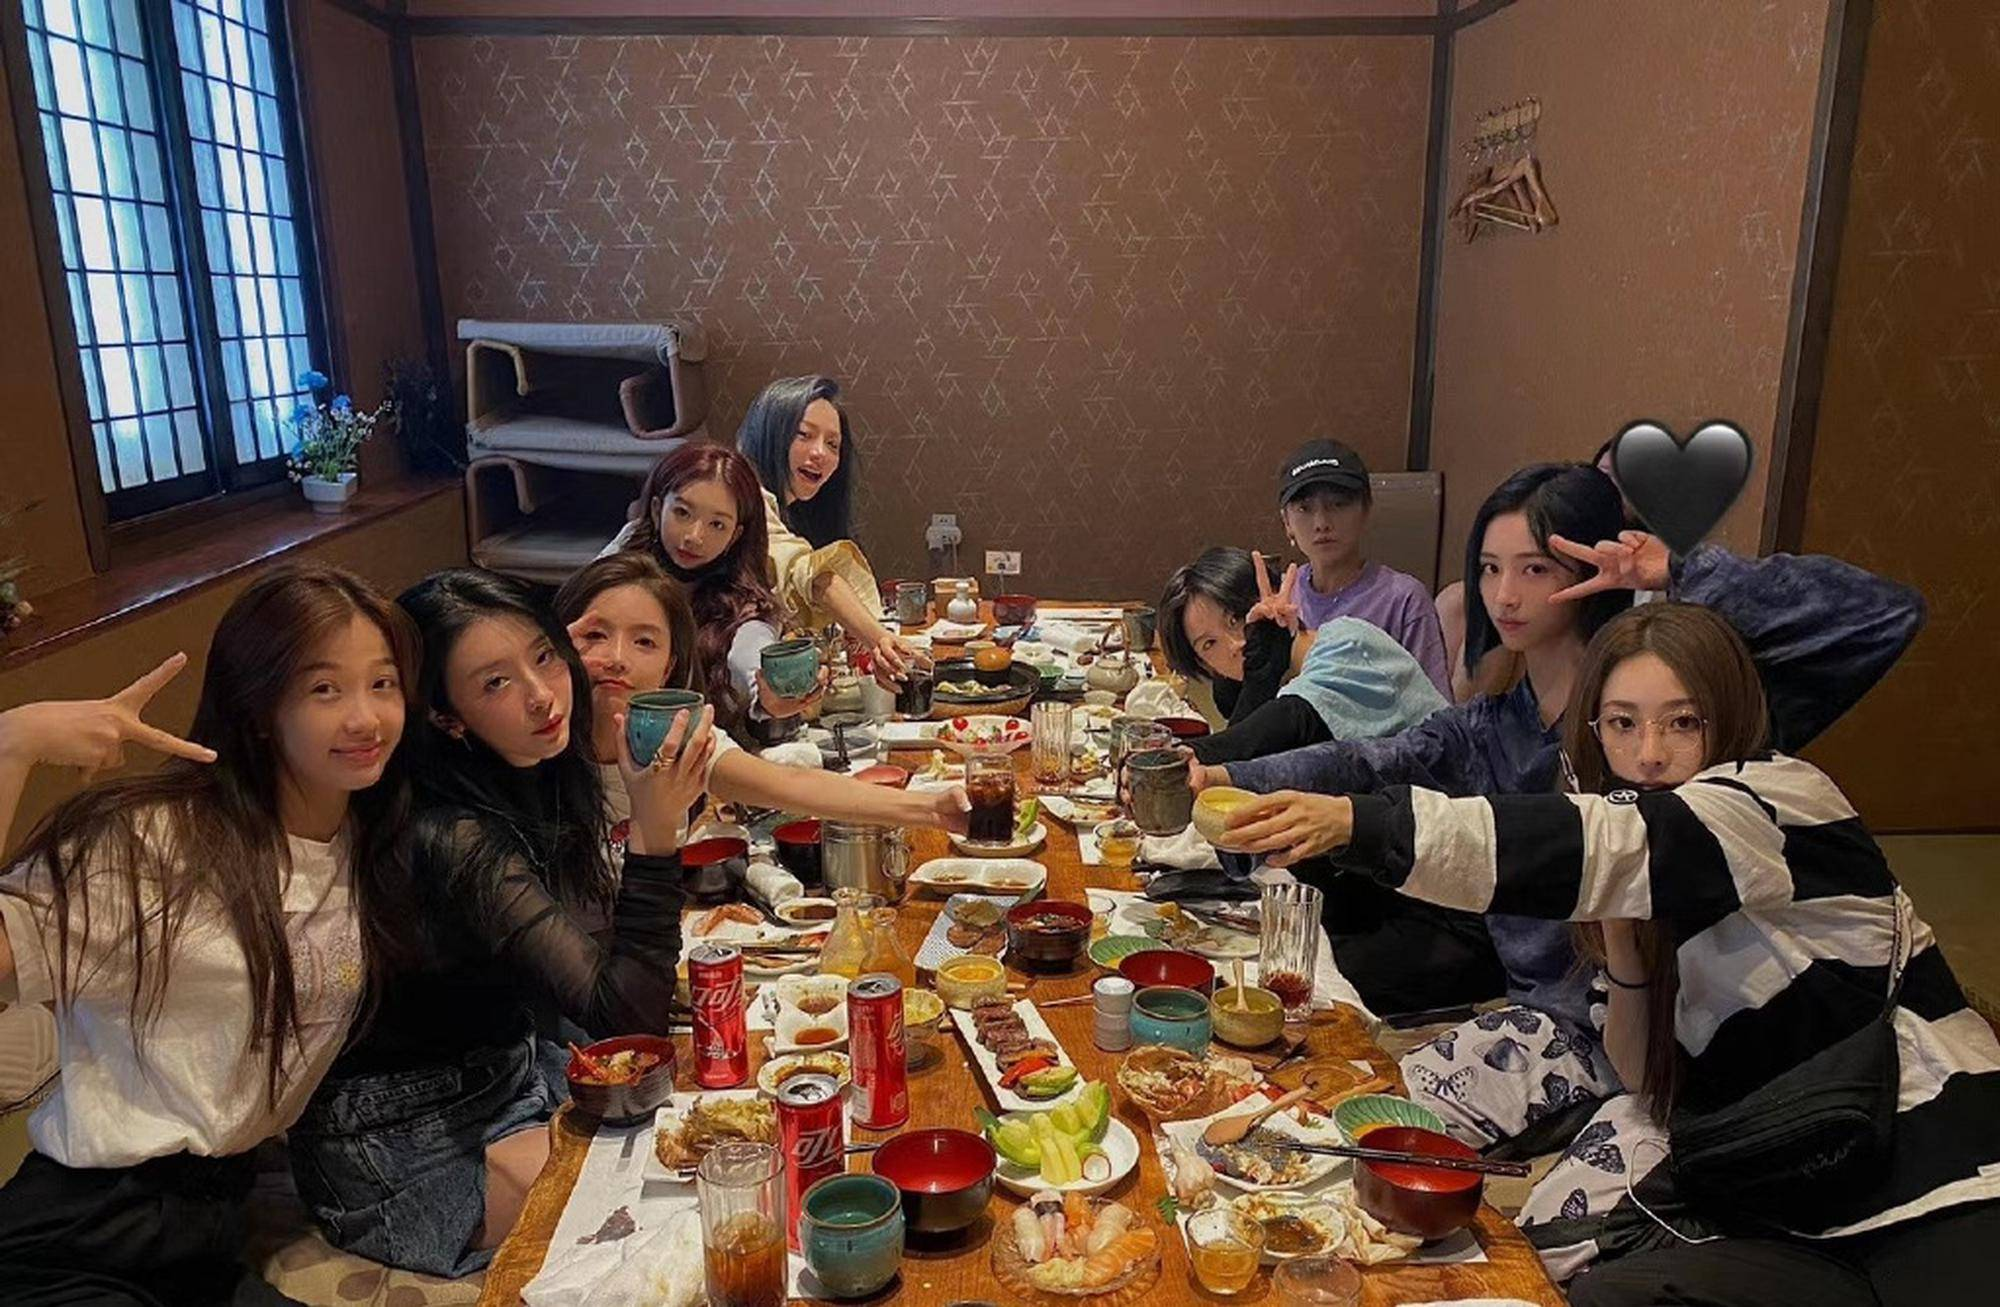 THE9聚餐合照 LISA导师发文祝贺THE9出道